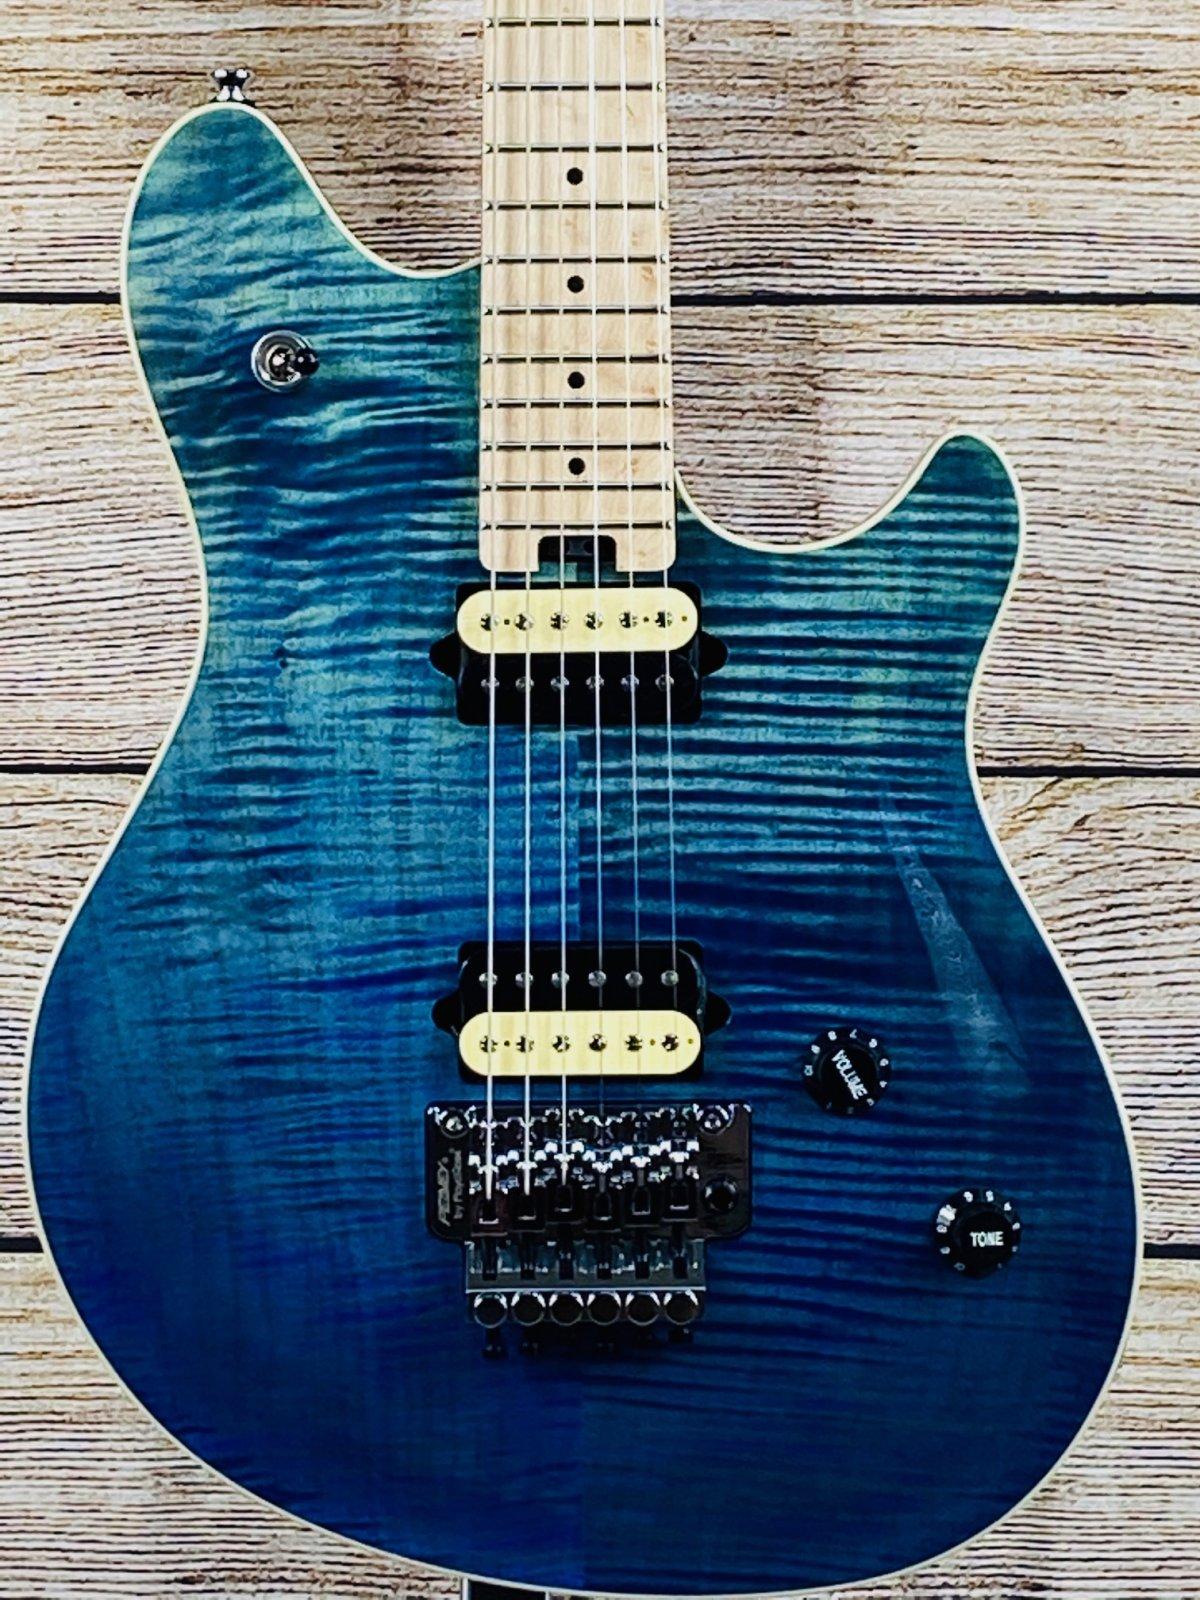 Peavey HP2 Electric Guitar Birds-Eye Maple Fretboard with Case, deep ocean blue